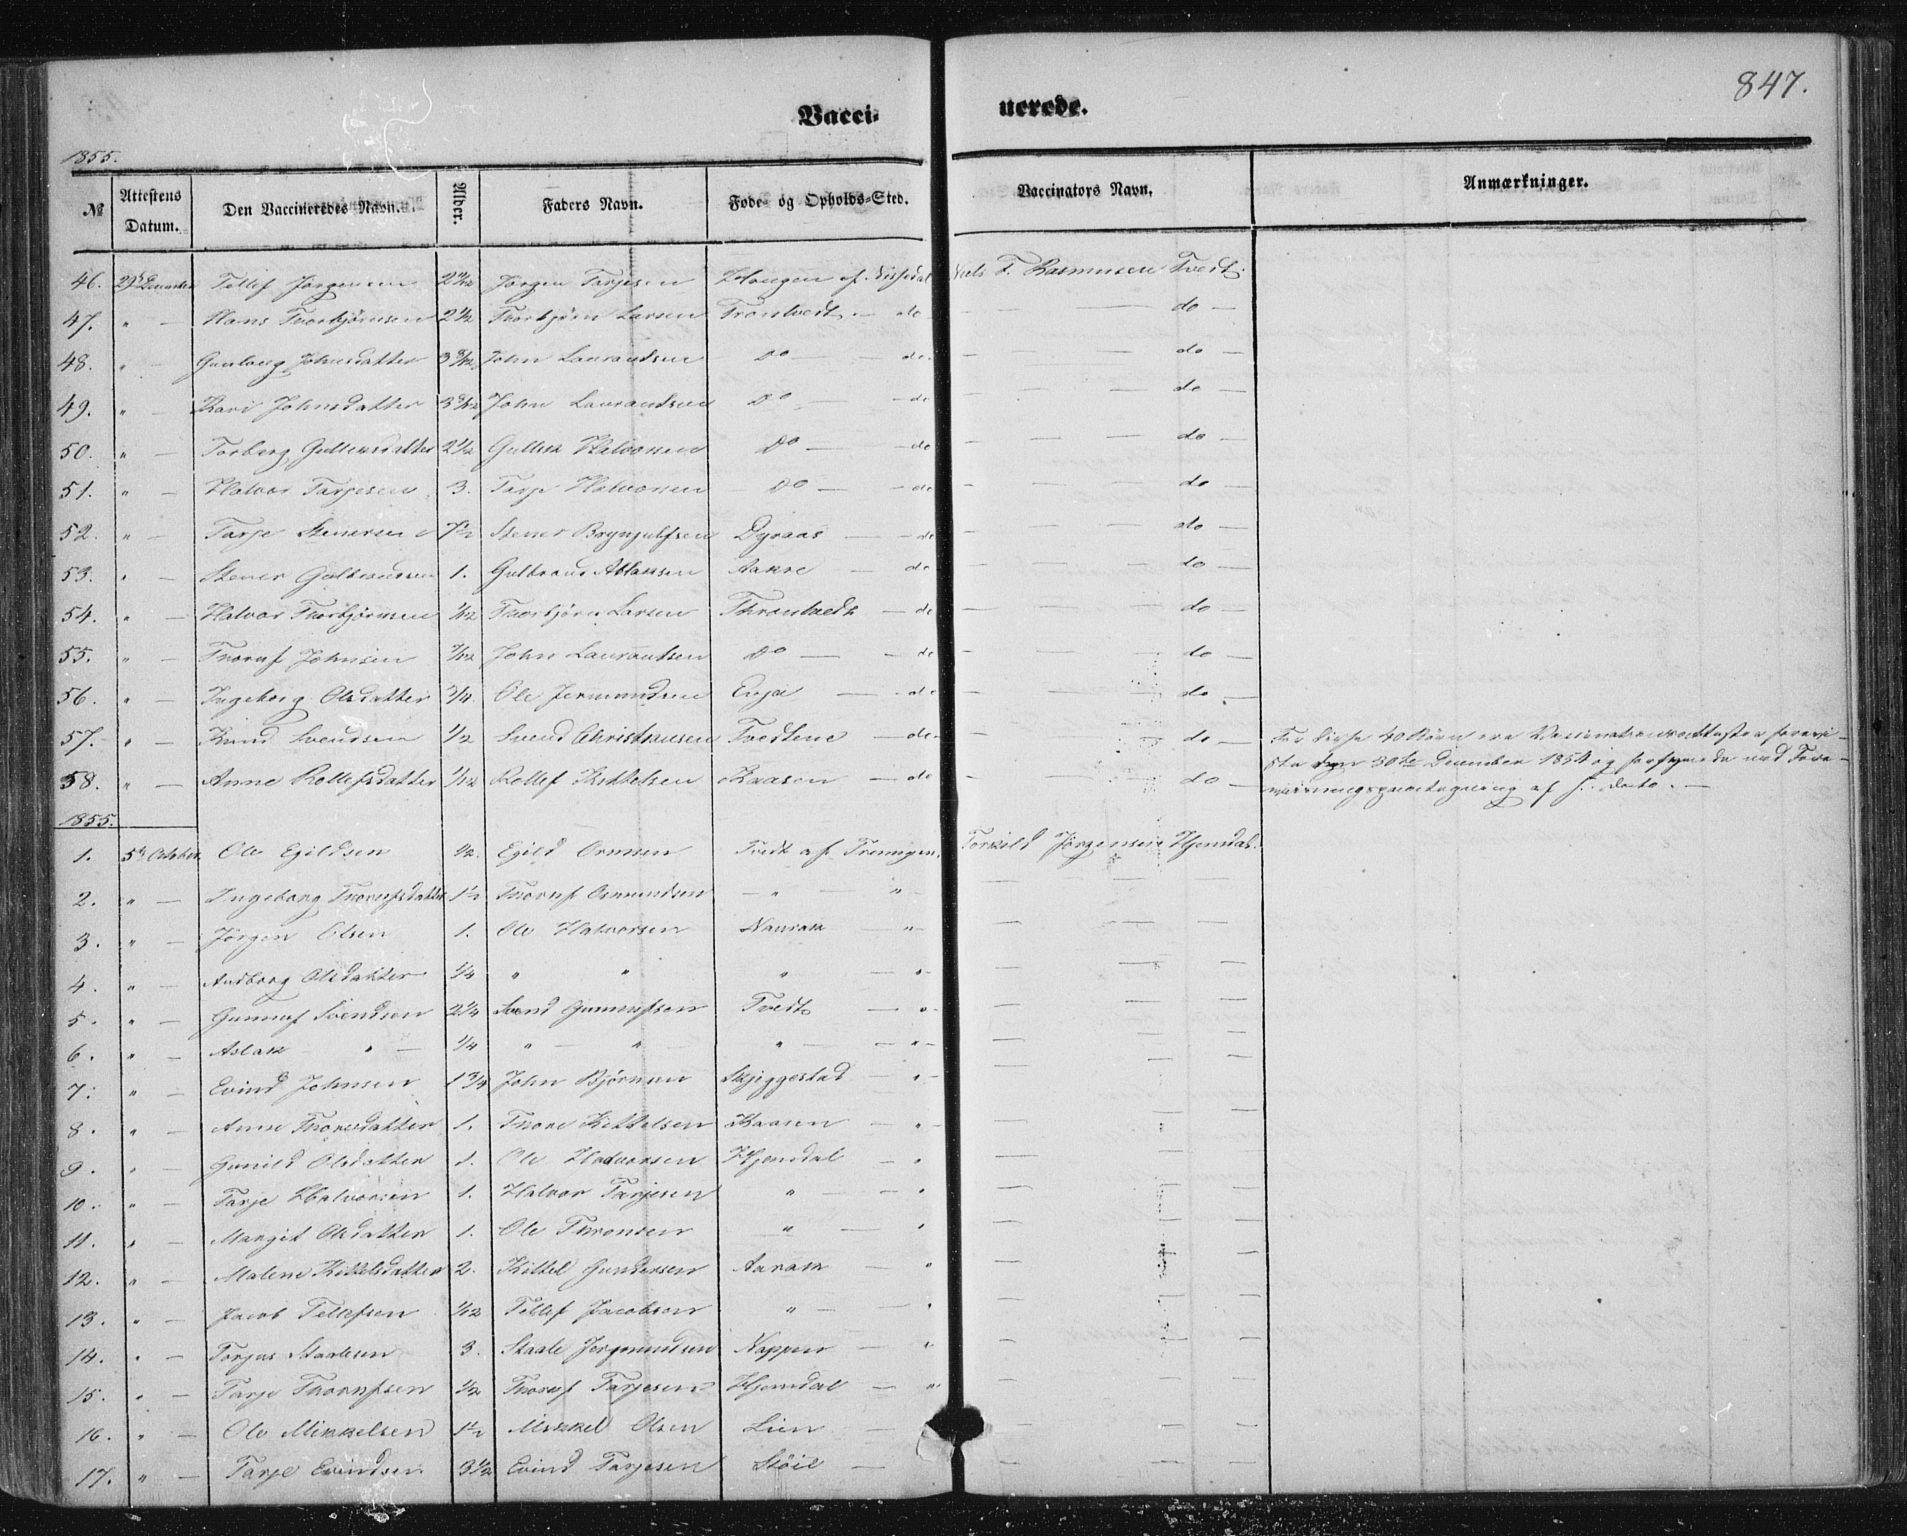 SAKO, Nissedal kirkebøker, F/Fa/L0003: Ministerialbok nr. I 3, 1846-1870, s. 846-847